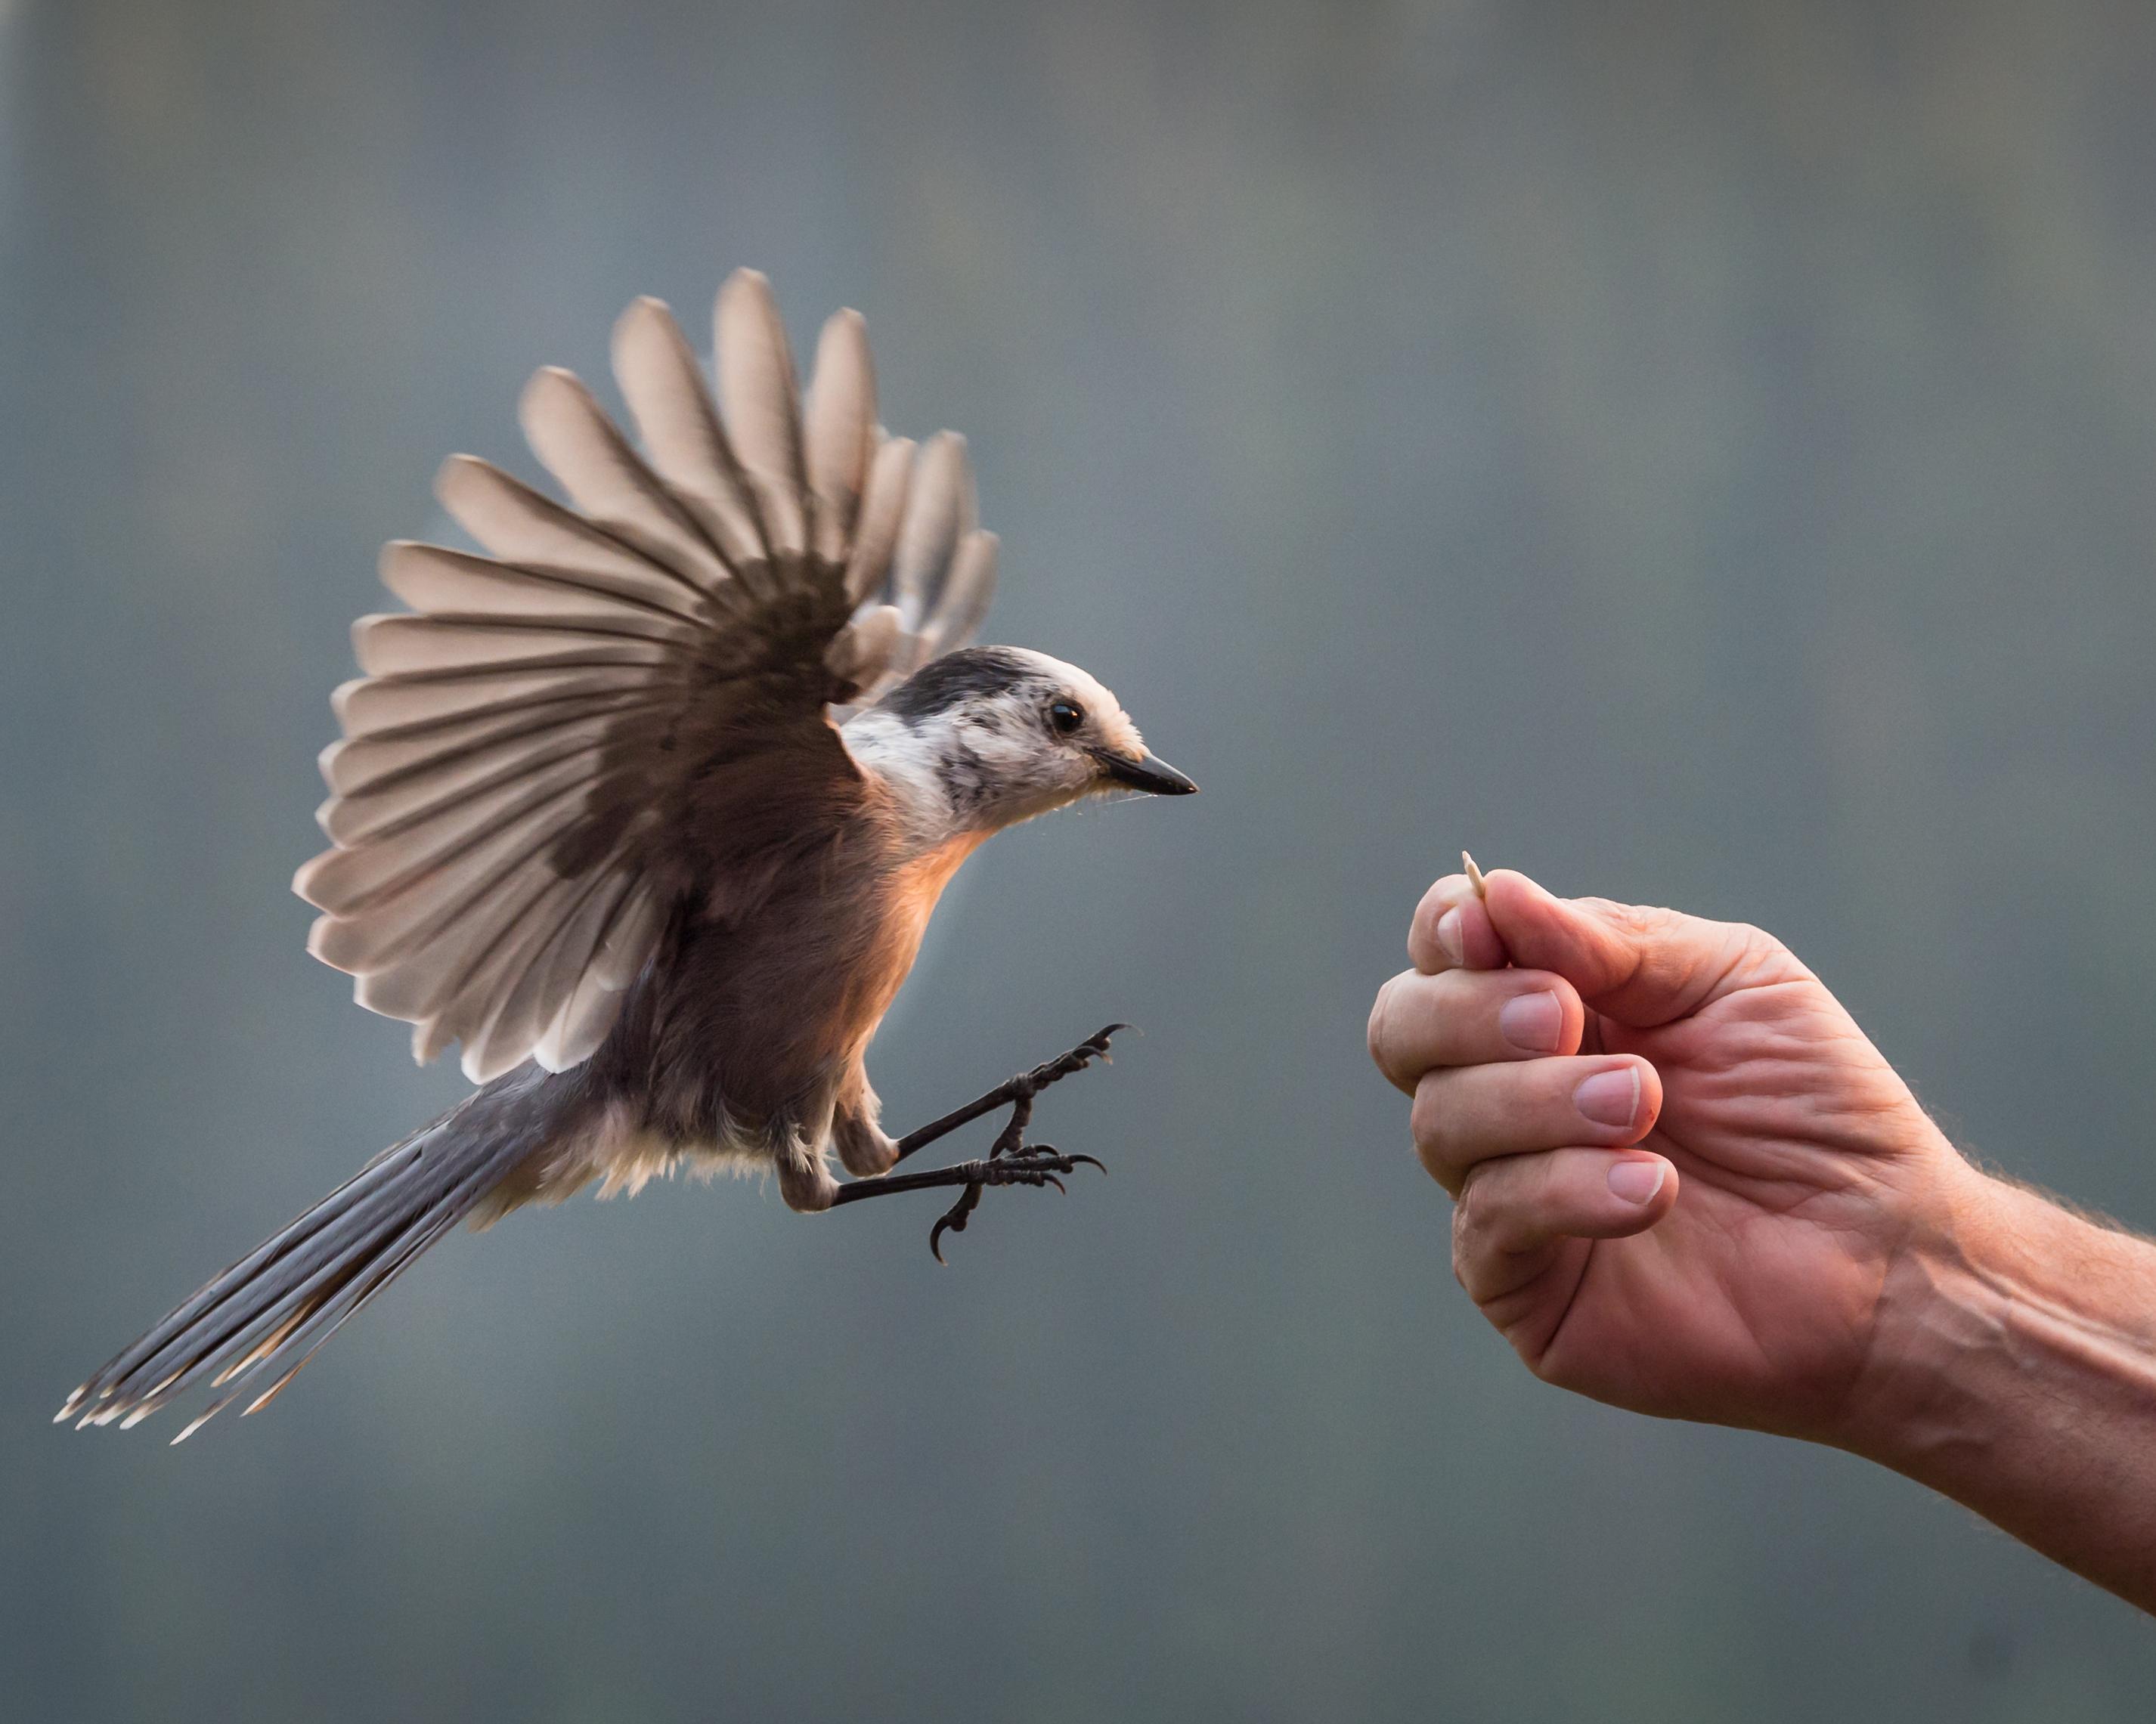 https://0901.nccdn.net/4_2/000/000/07f/5ee/wildlife_01.jpg